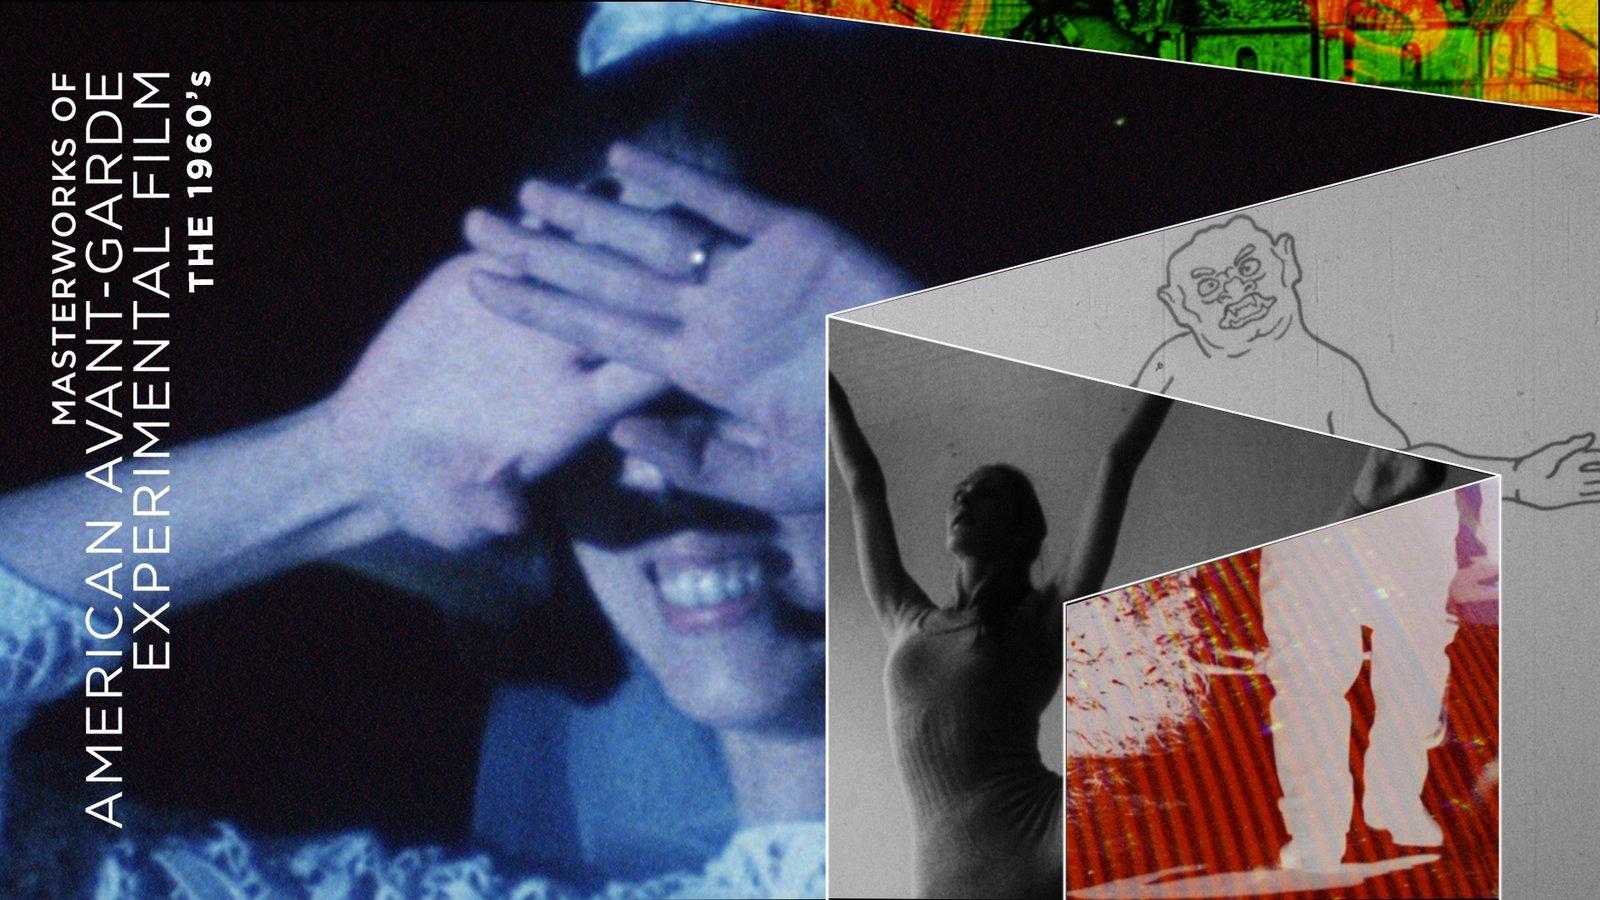 Masterworks of American Avant-garde Experimental Film - The 1960s